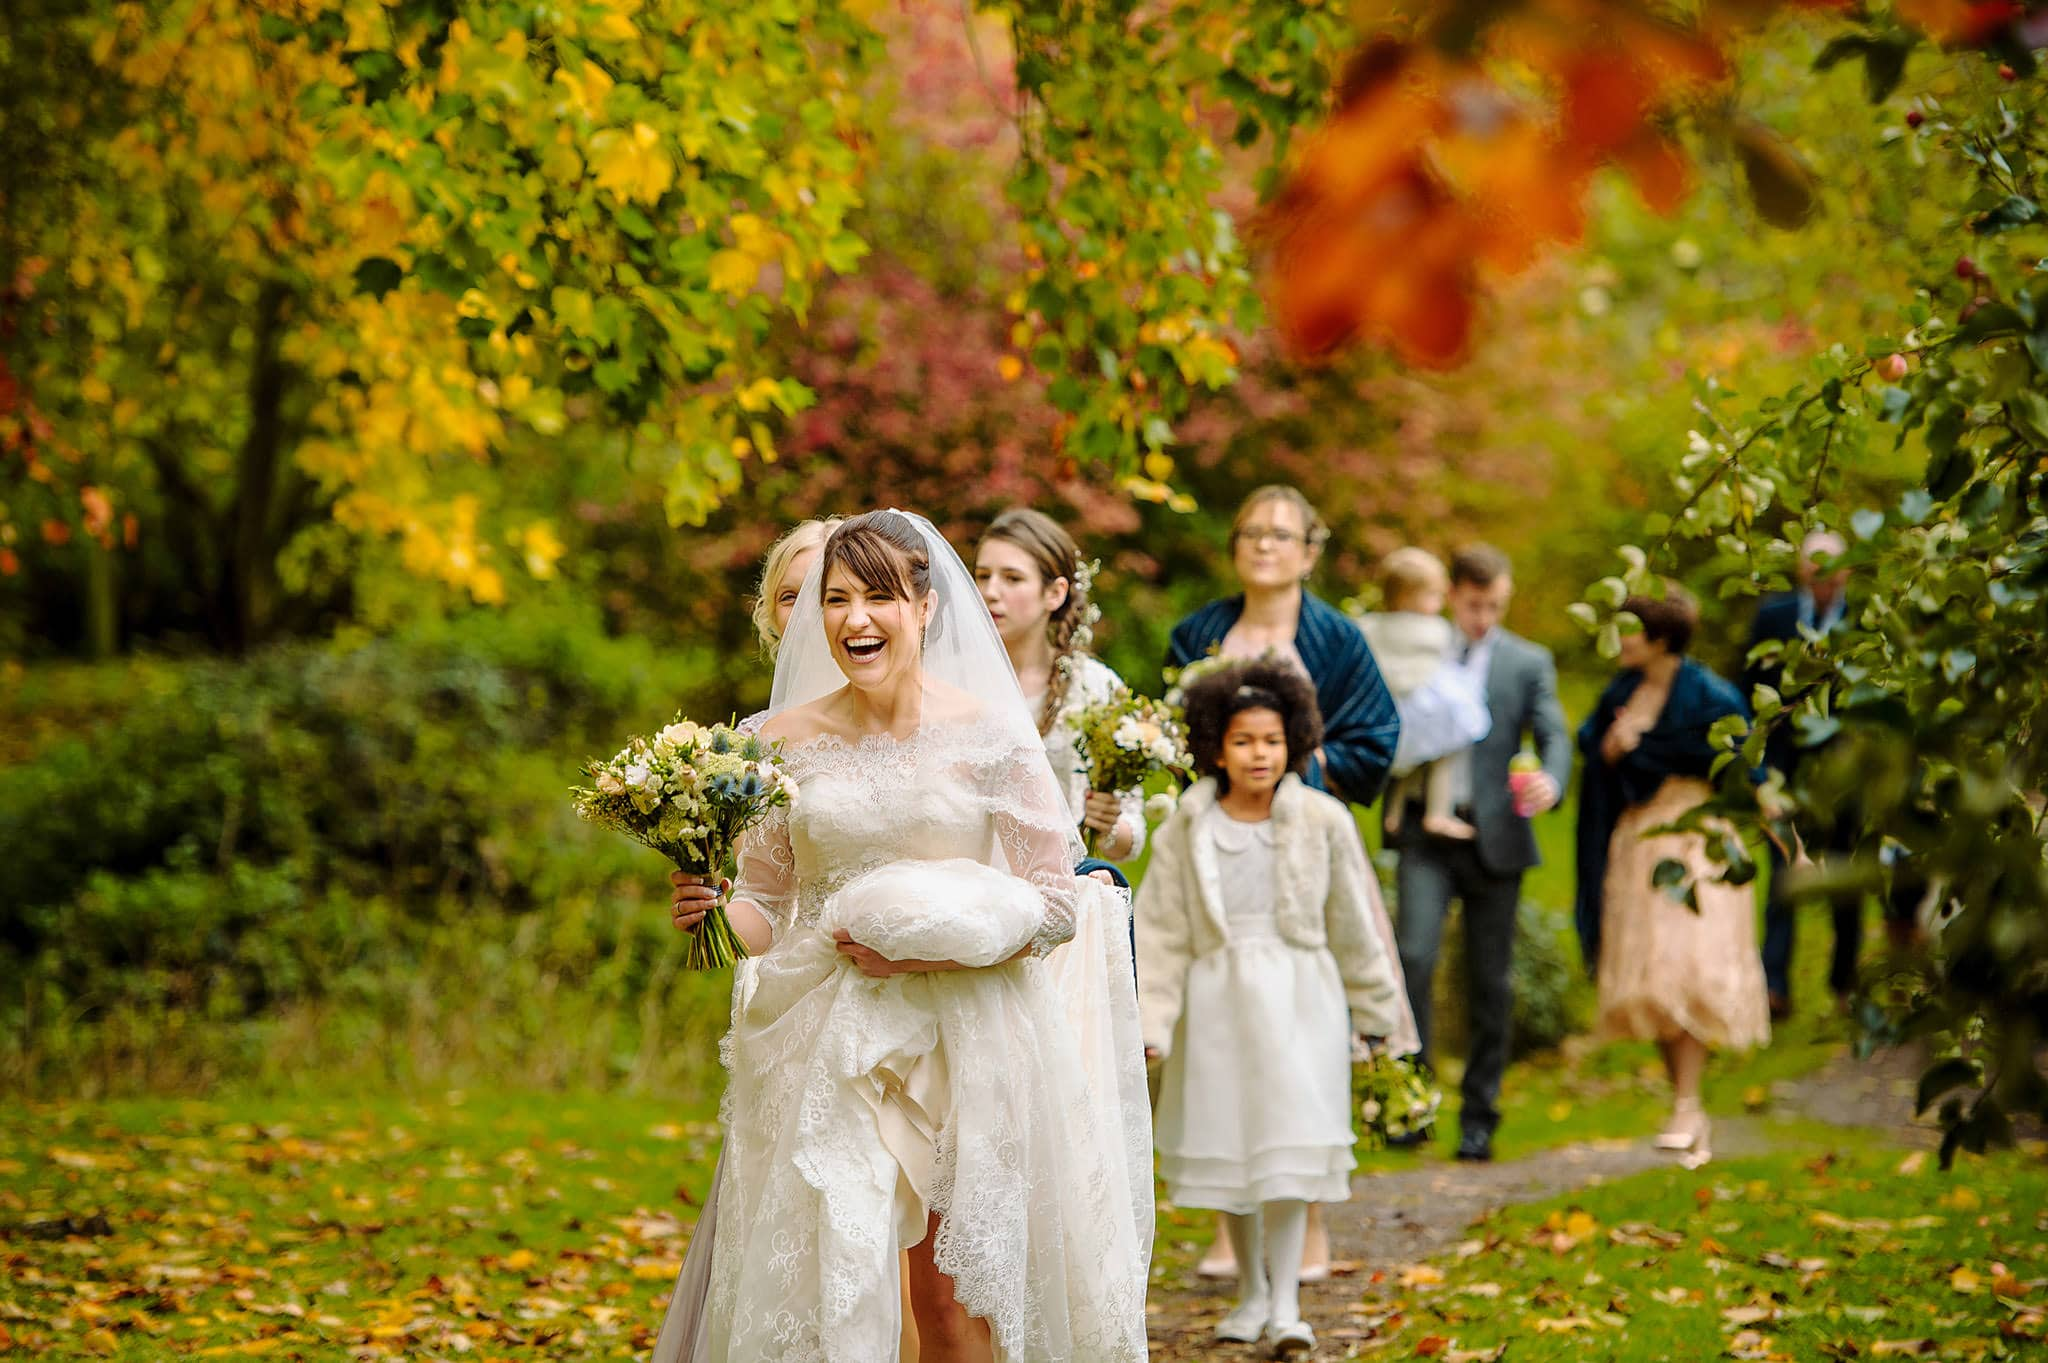 Dewsall Court wedding photography Herefordshire | Laura + Alex 47